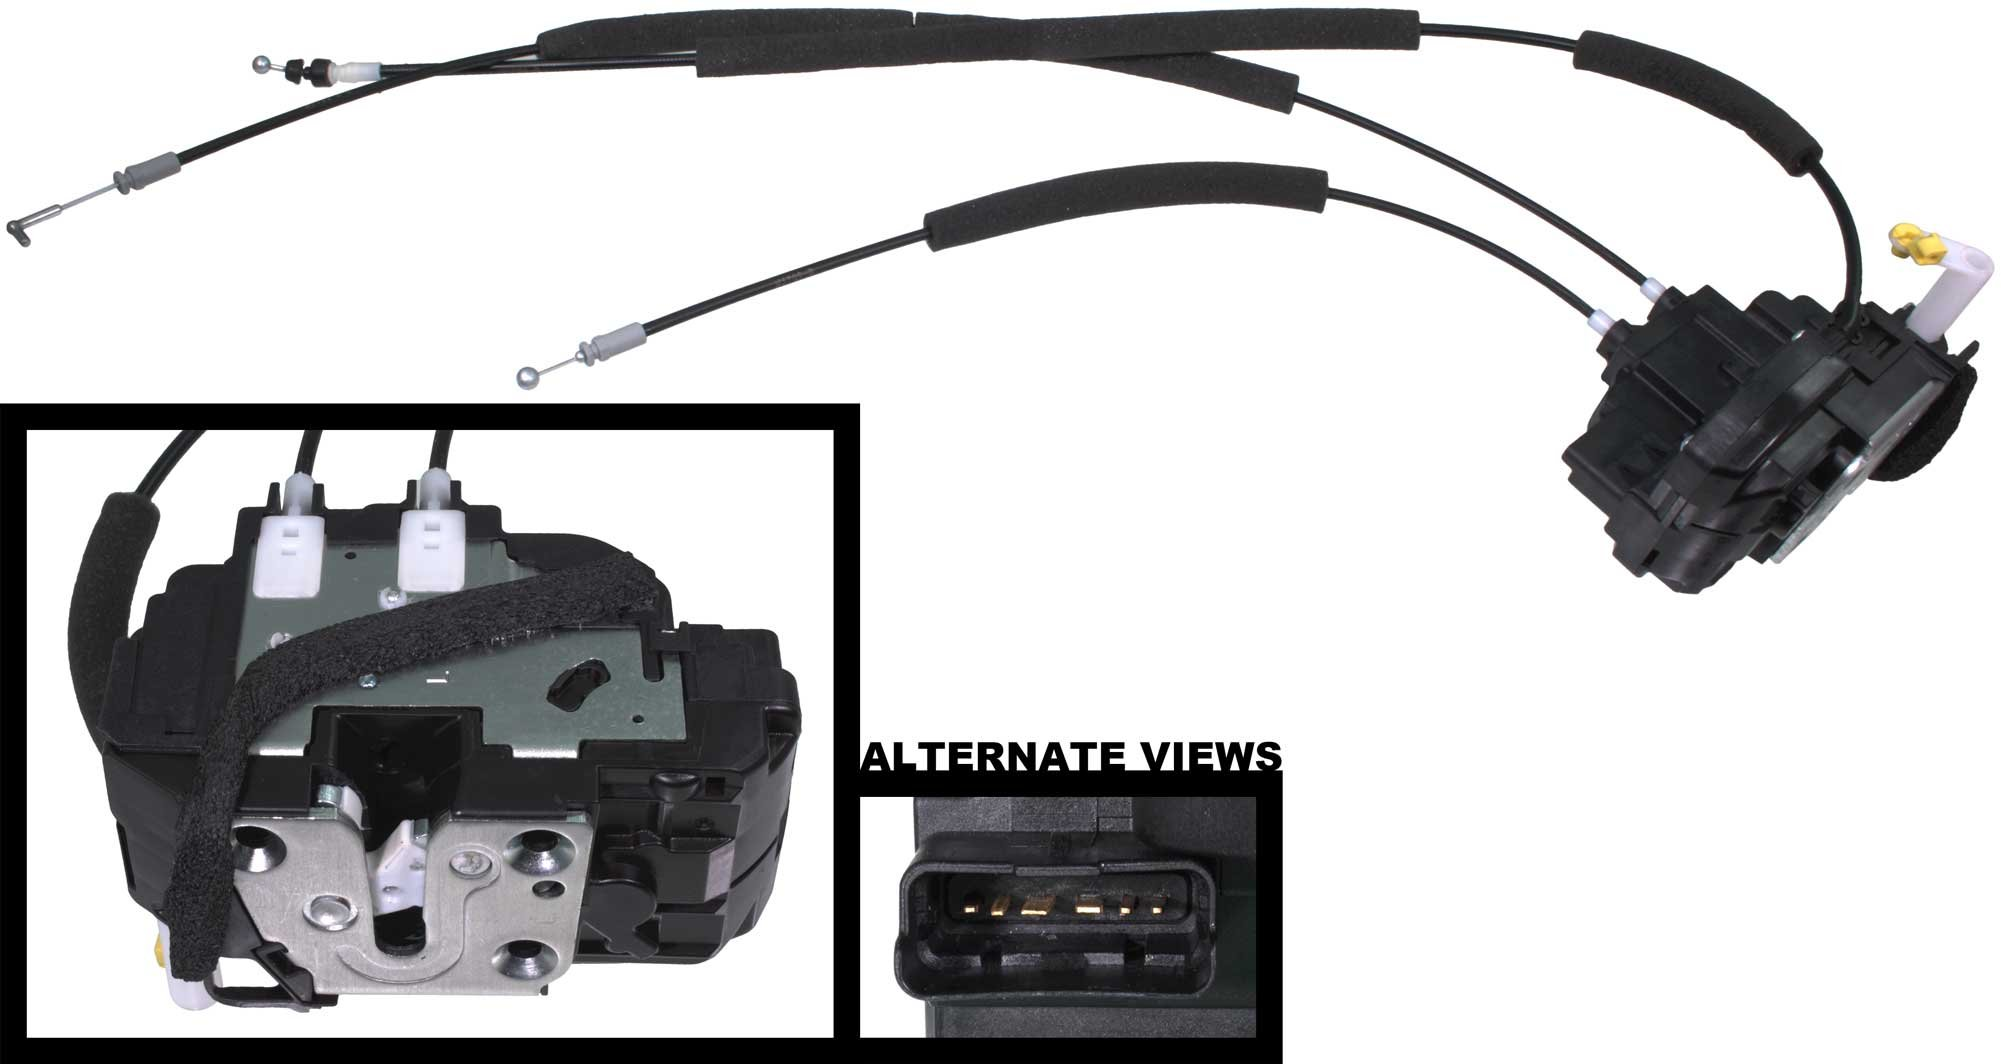 APDTY 048343 Door Lock Actuator Motor w/ Cable Fits Front Left Driver-Side 2005-2015 Nissan Titan 2005-2007 Armada & Infiniti QX56 (Replaces 805019FG0A, 80501ZH01A, 80501ZQ00B, 80501ZQ01B, 80501ZT01A)